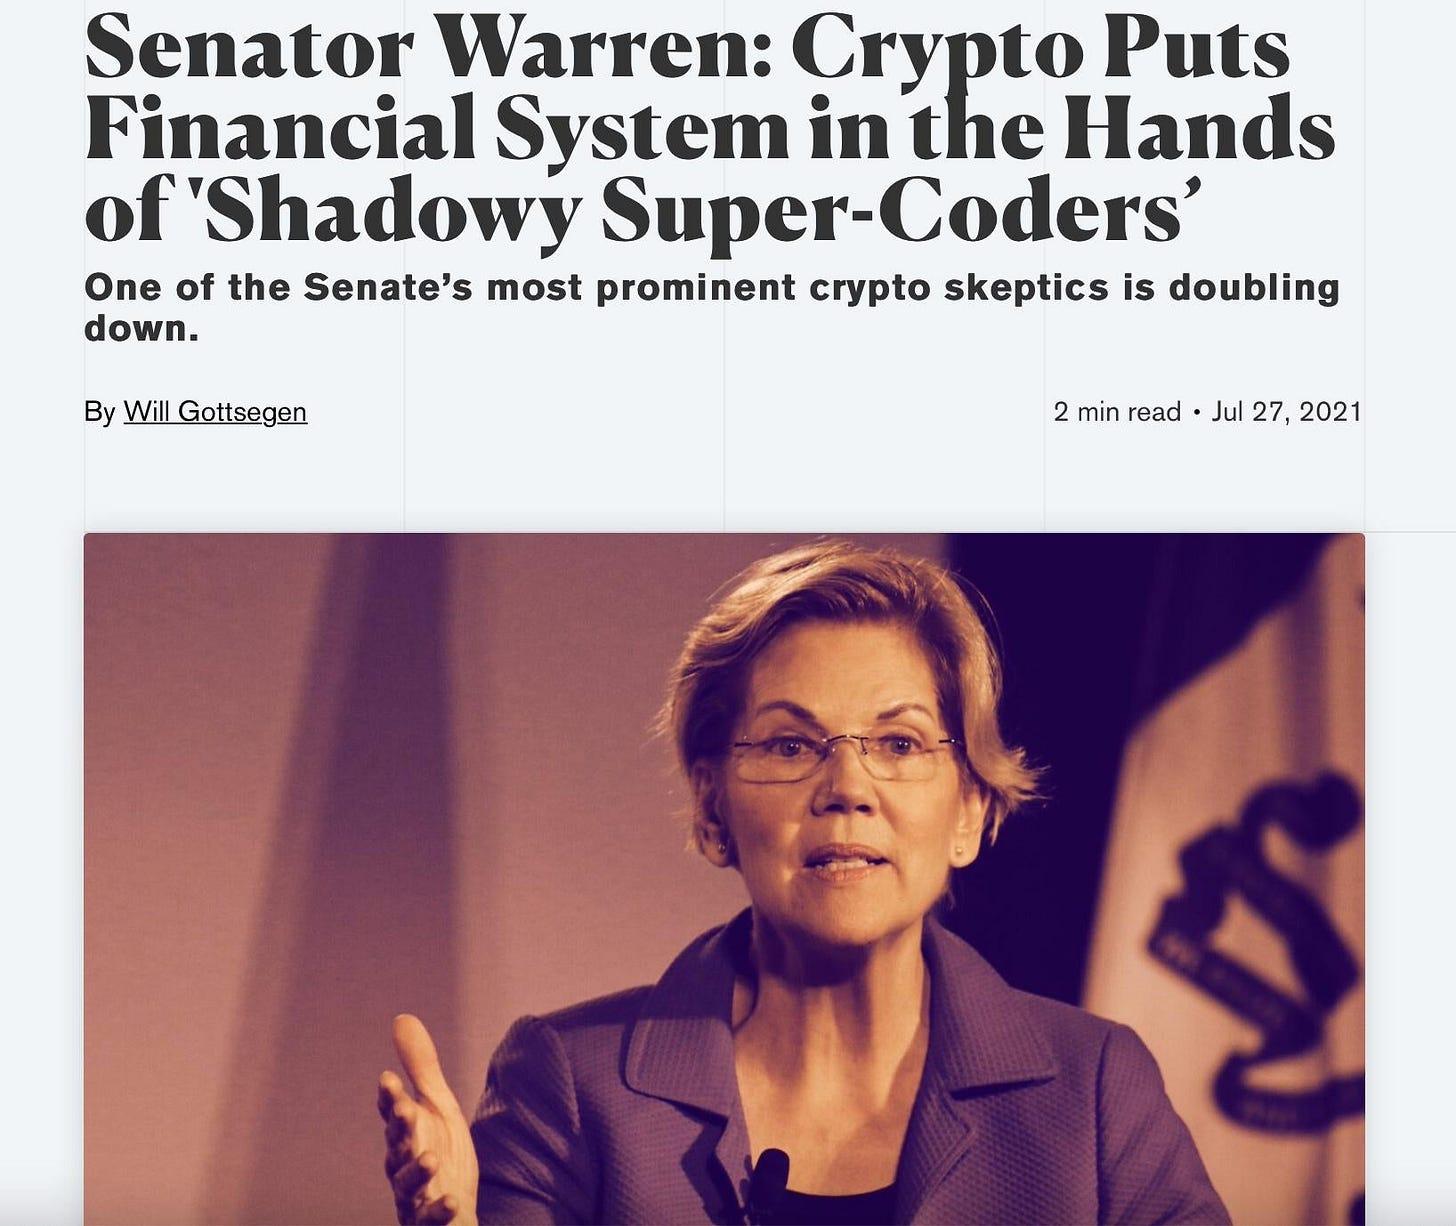 Shadowy Super-Coders'!: BitcoinCA